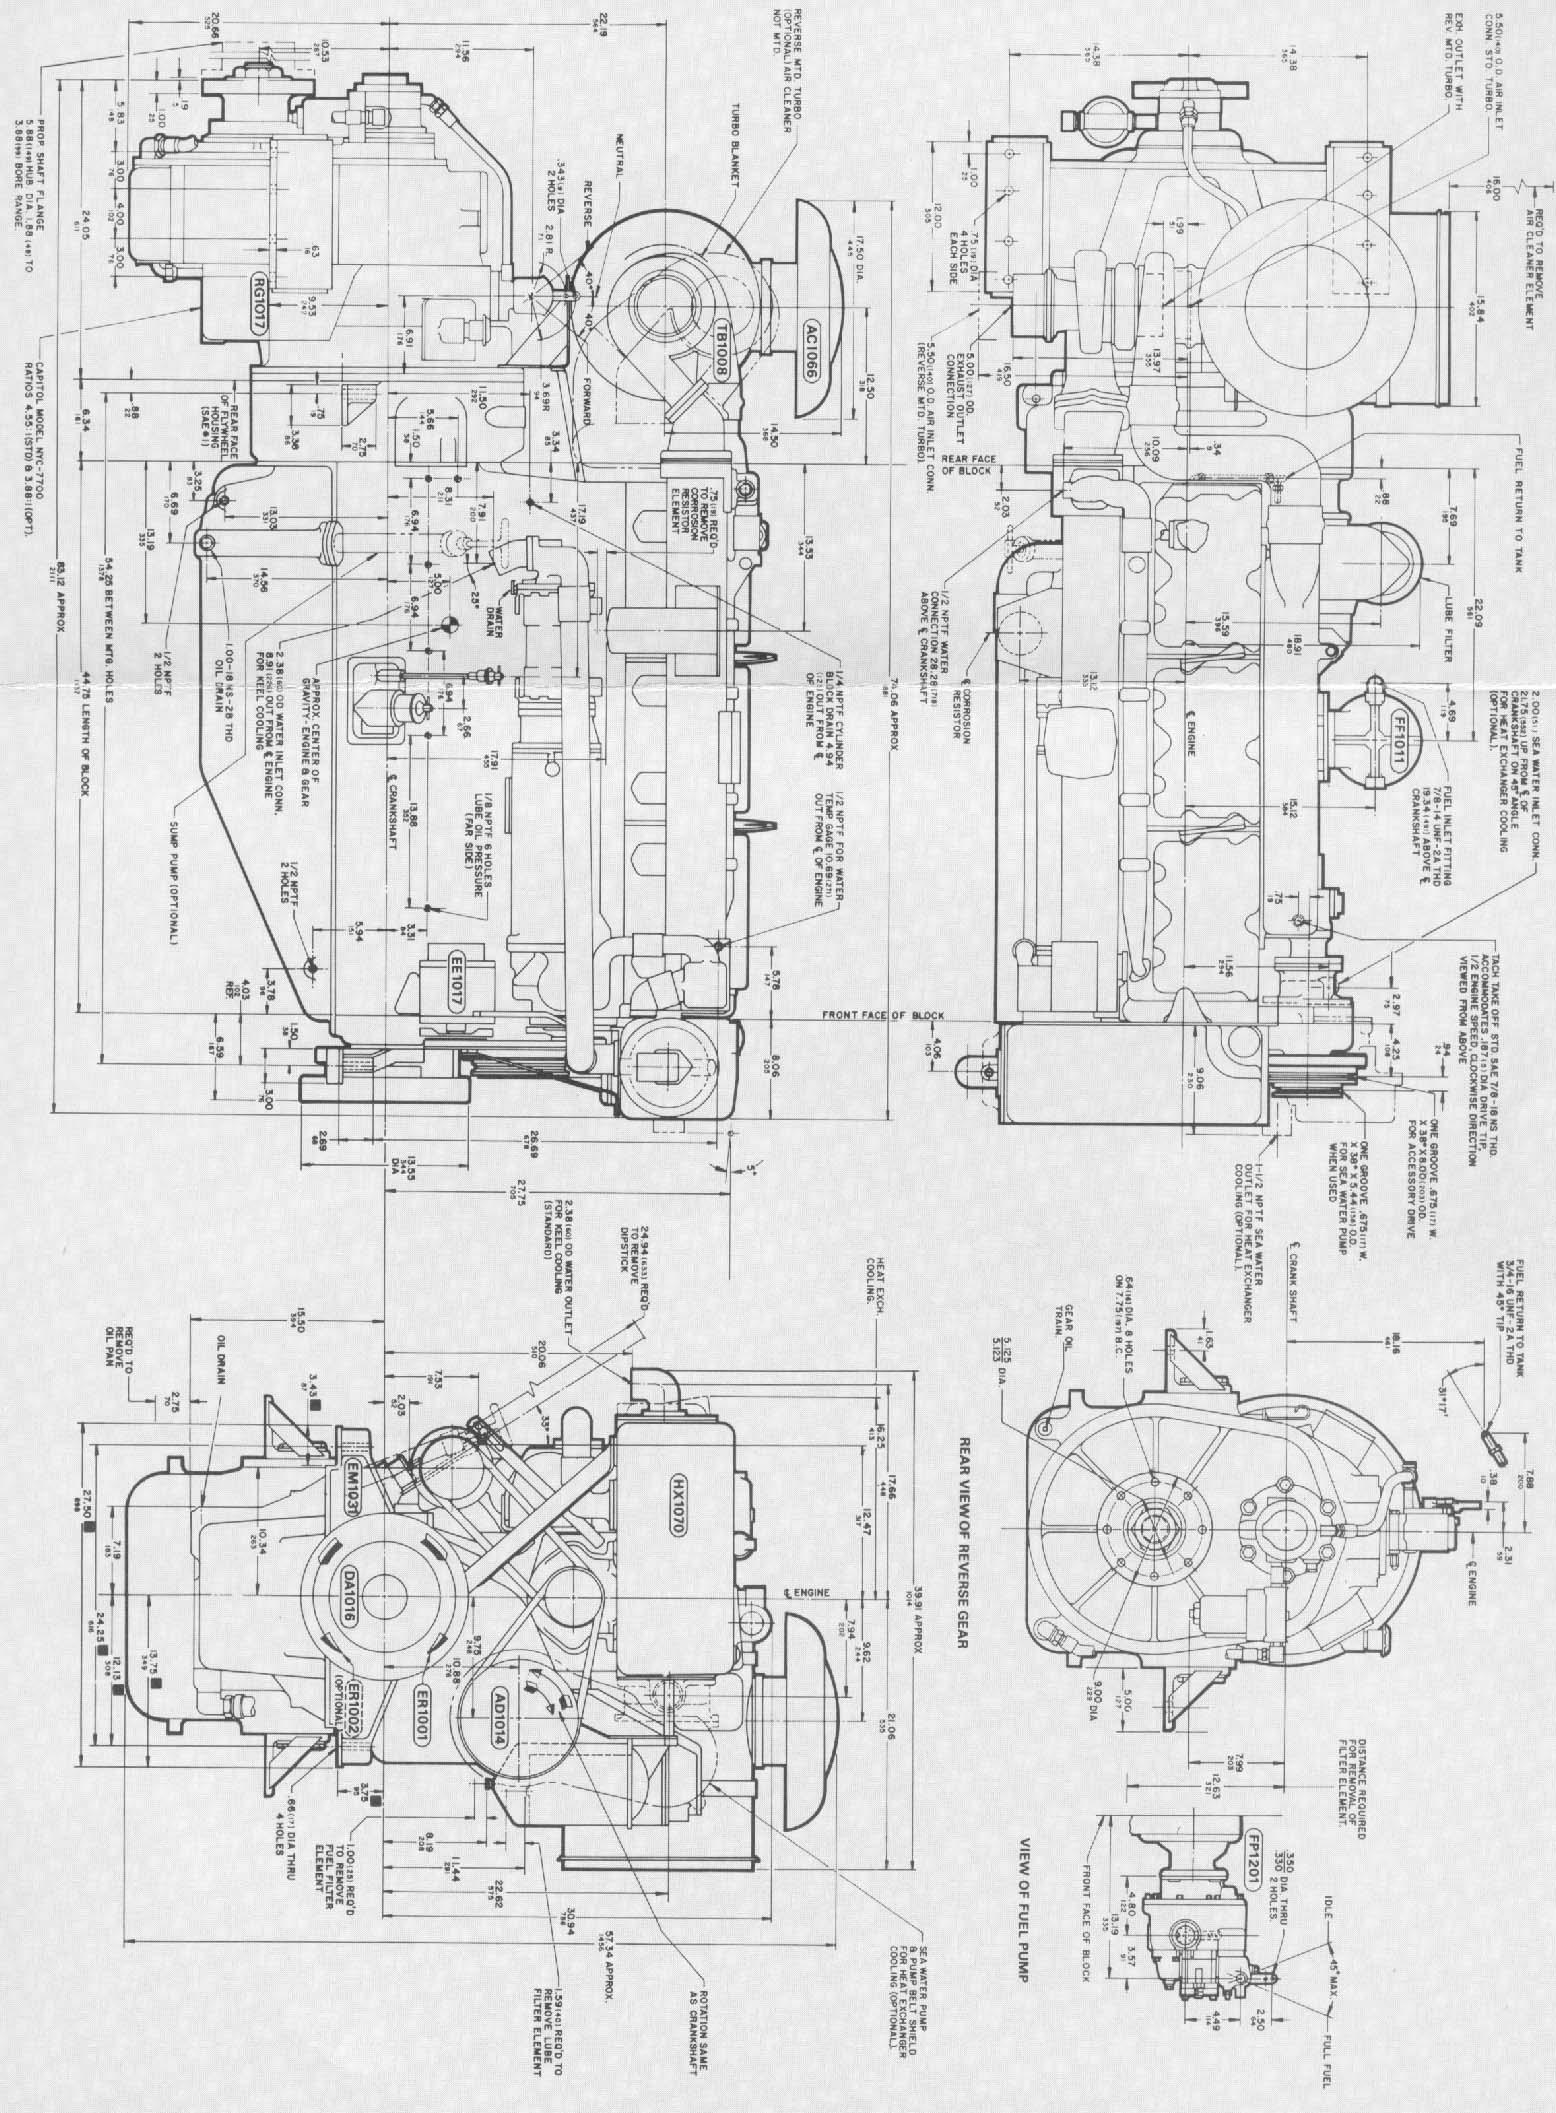 detroit generator wiring diagram